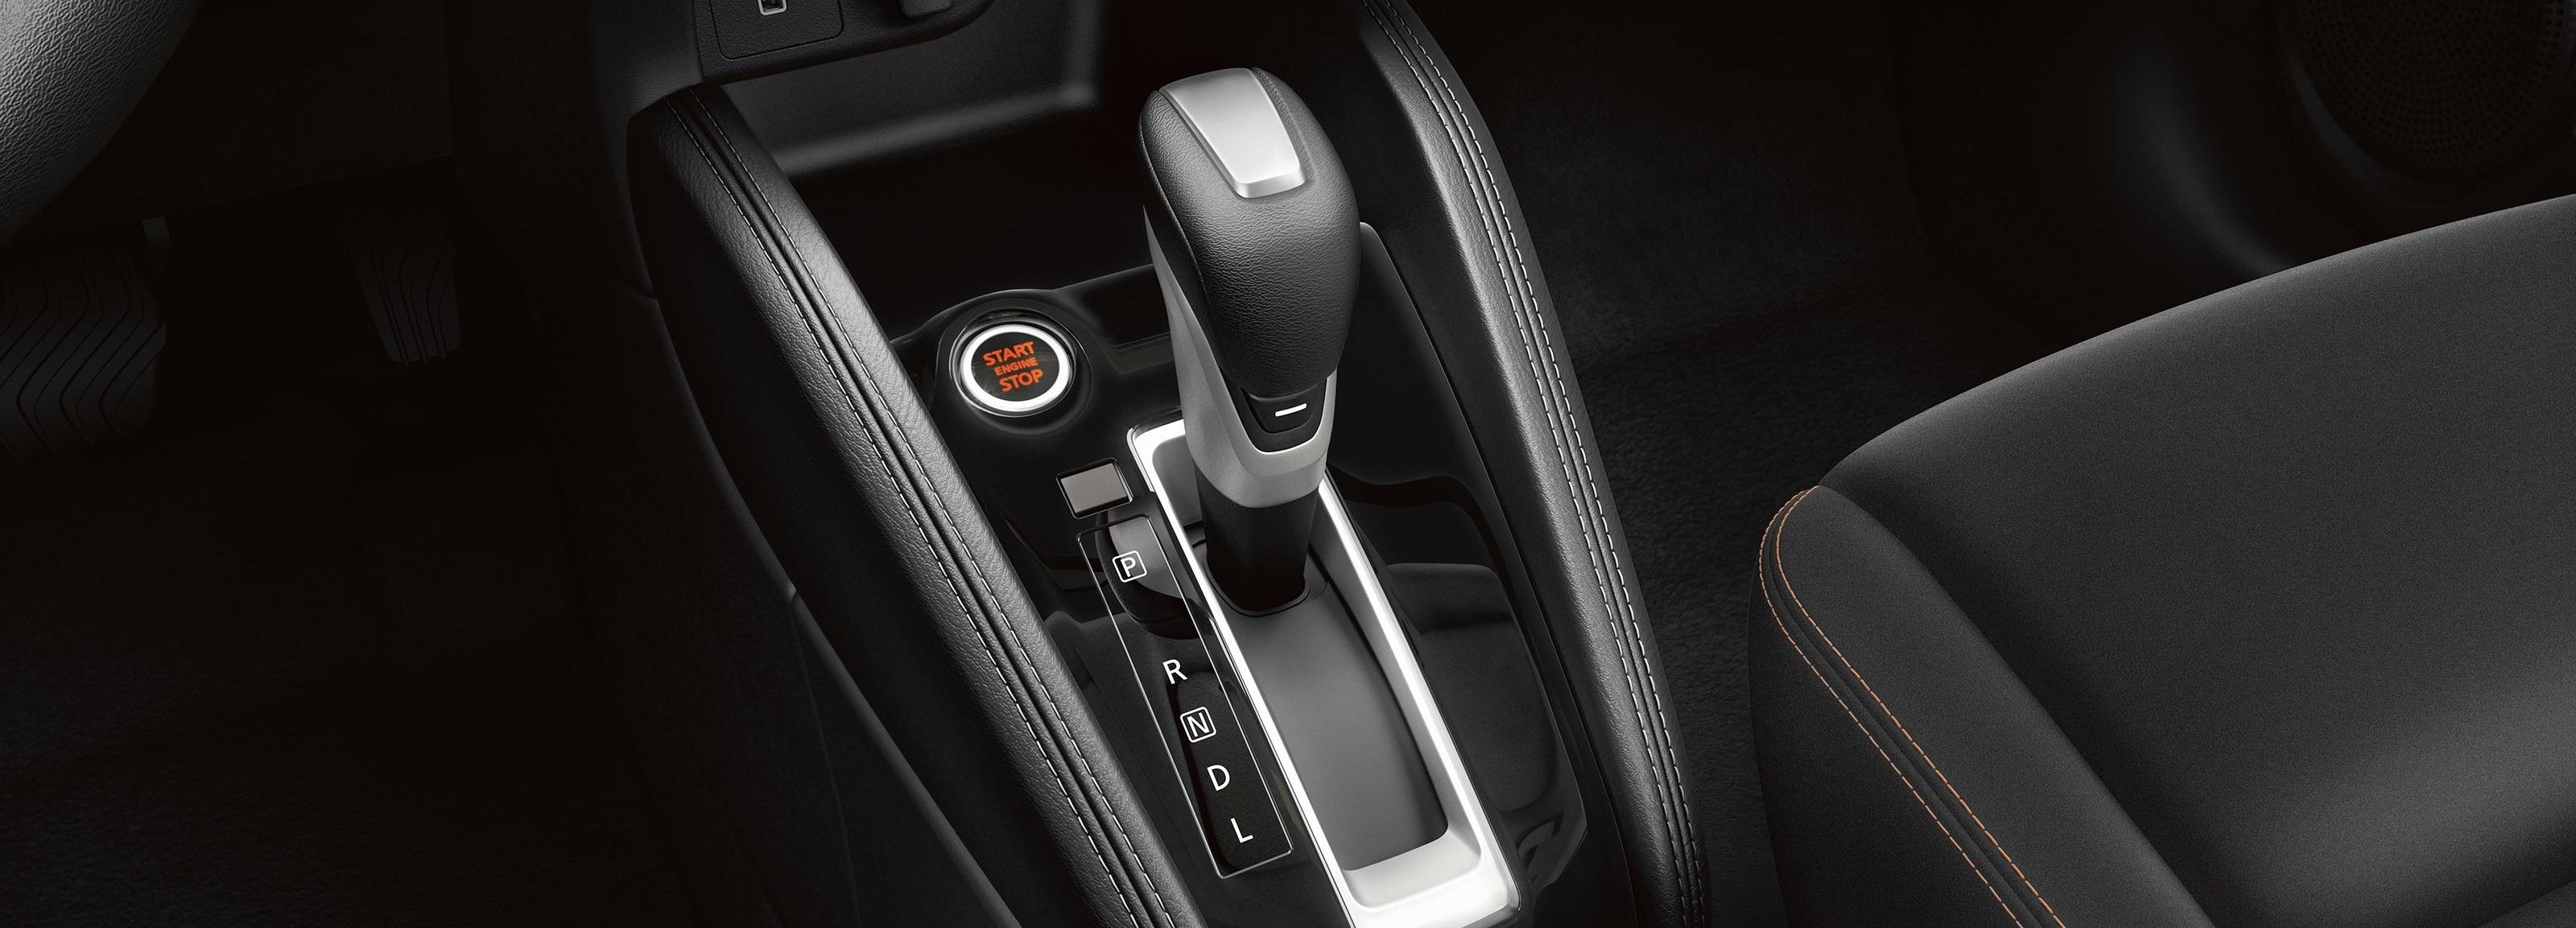 2020 Nissan Kicks Gear Shifter